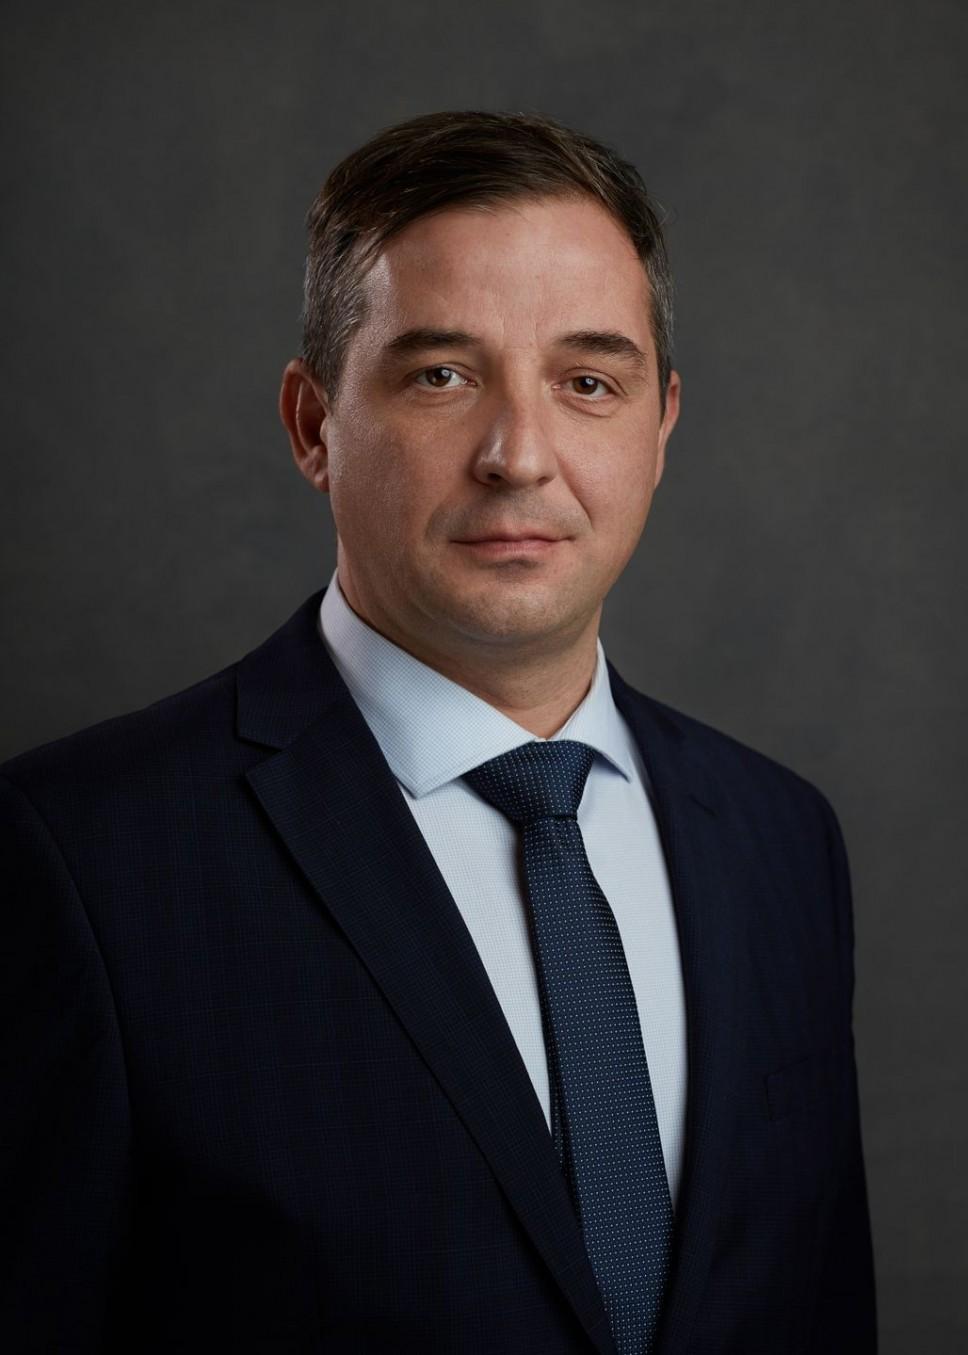 Biografija - Vujović Aleksandar